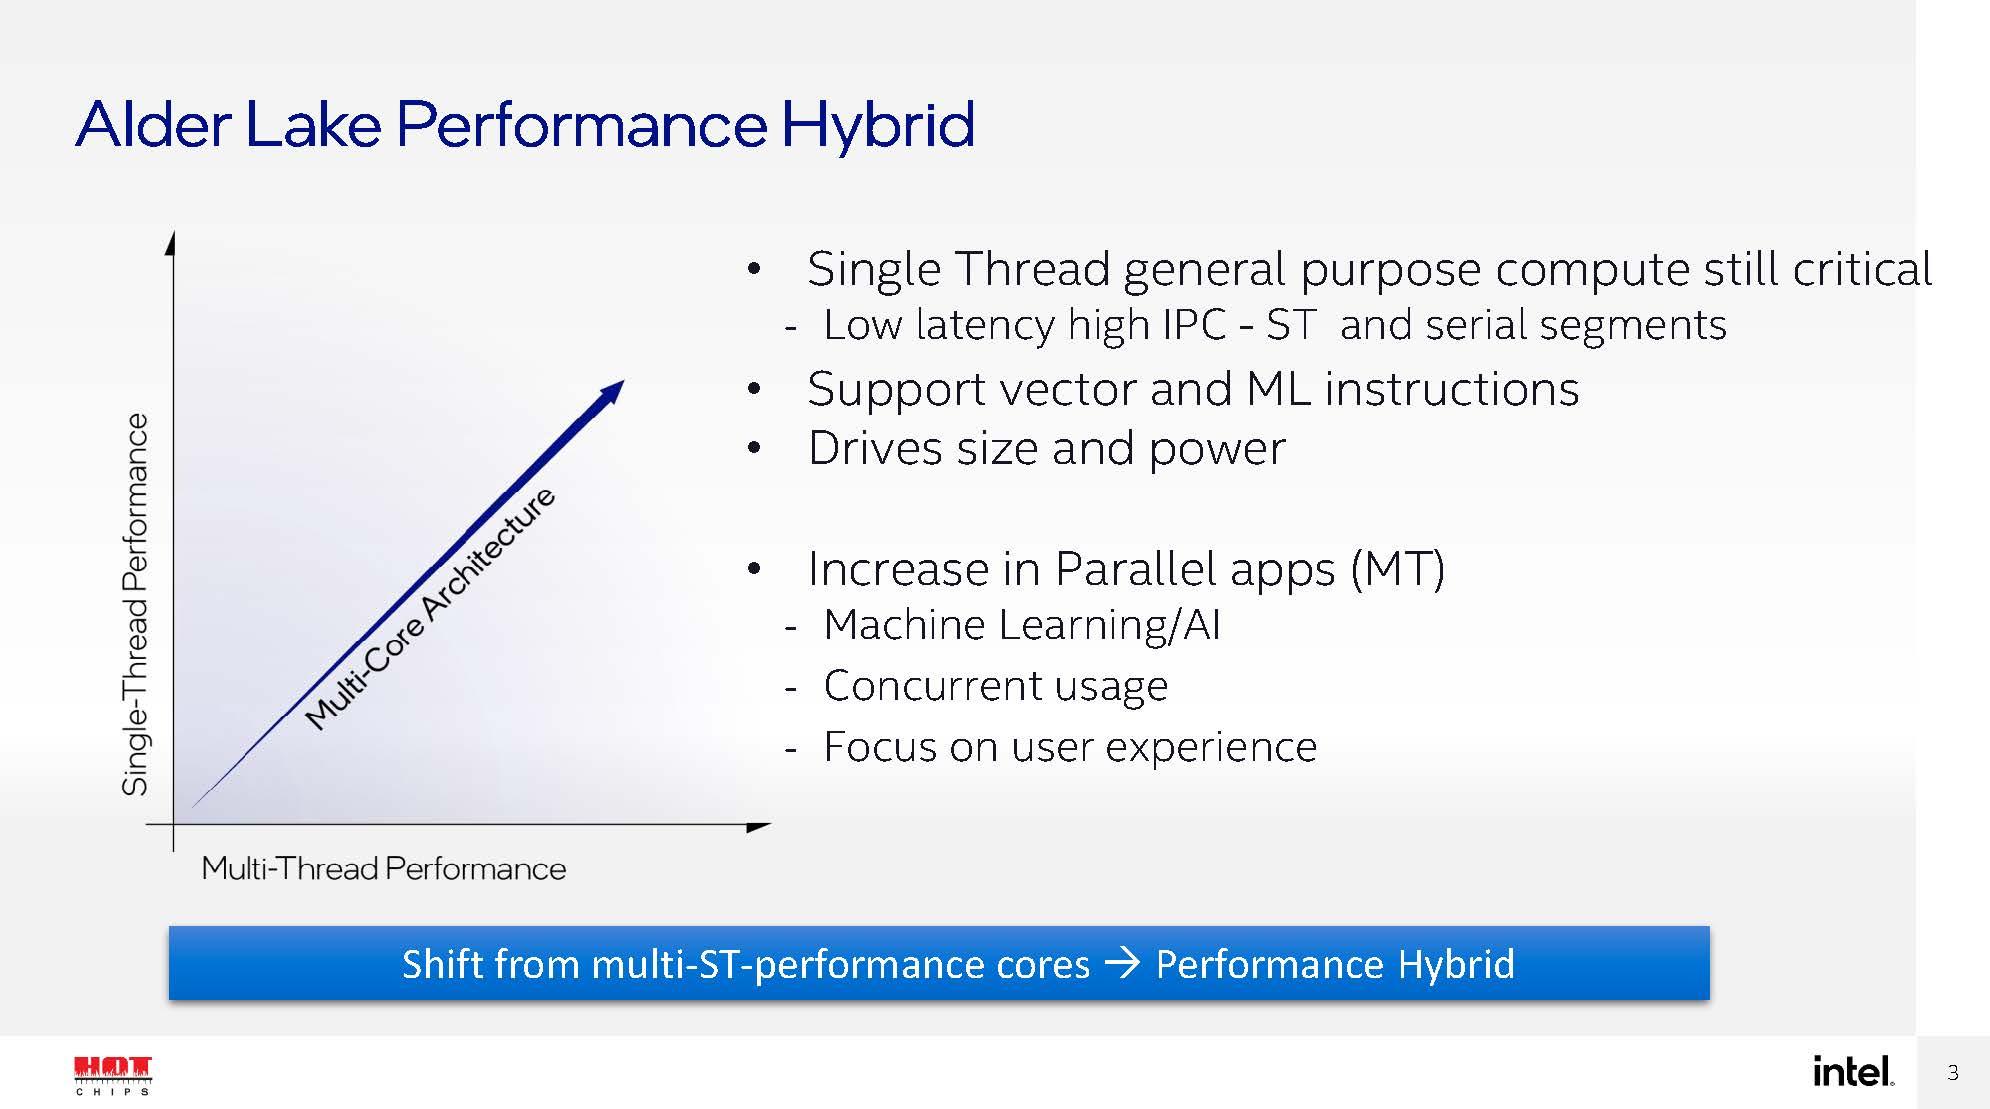 HC33 Intel Alder Lake Performance Hybrid 1